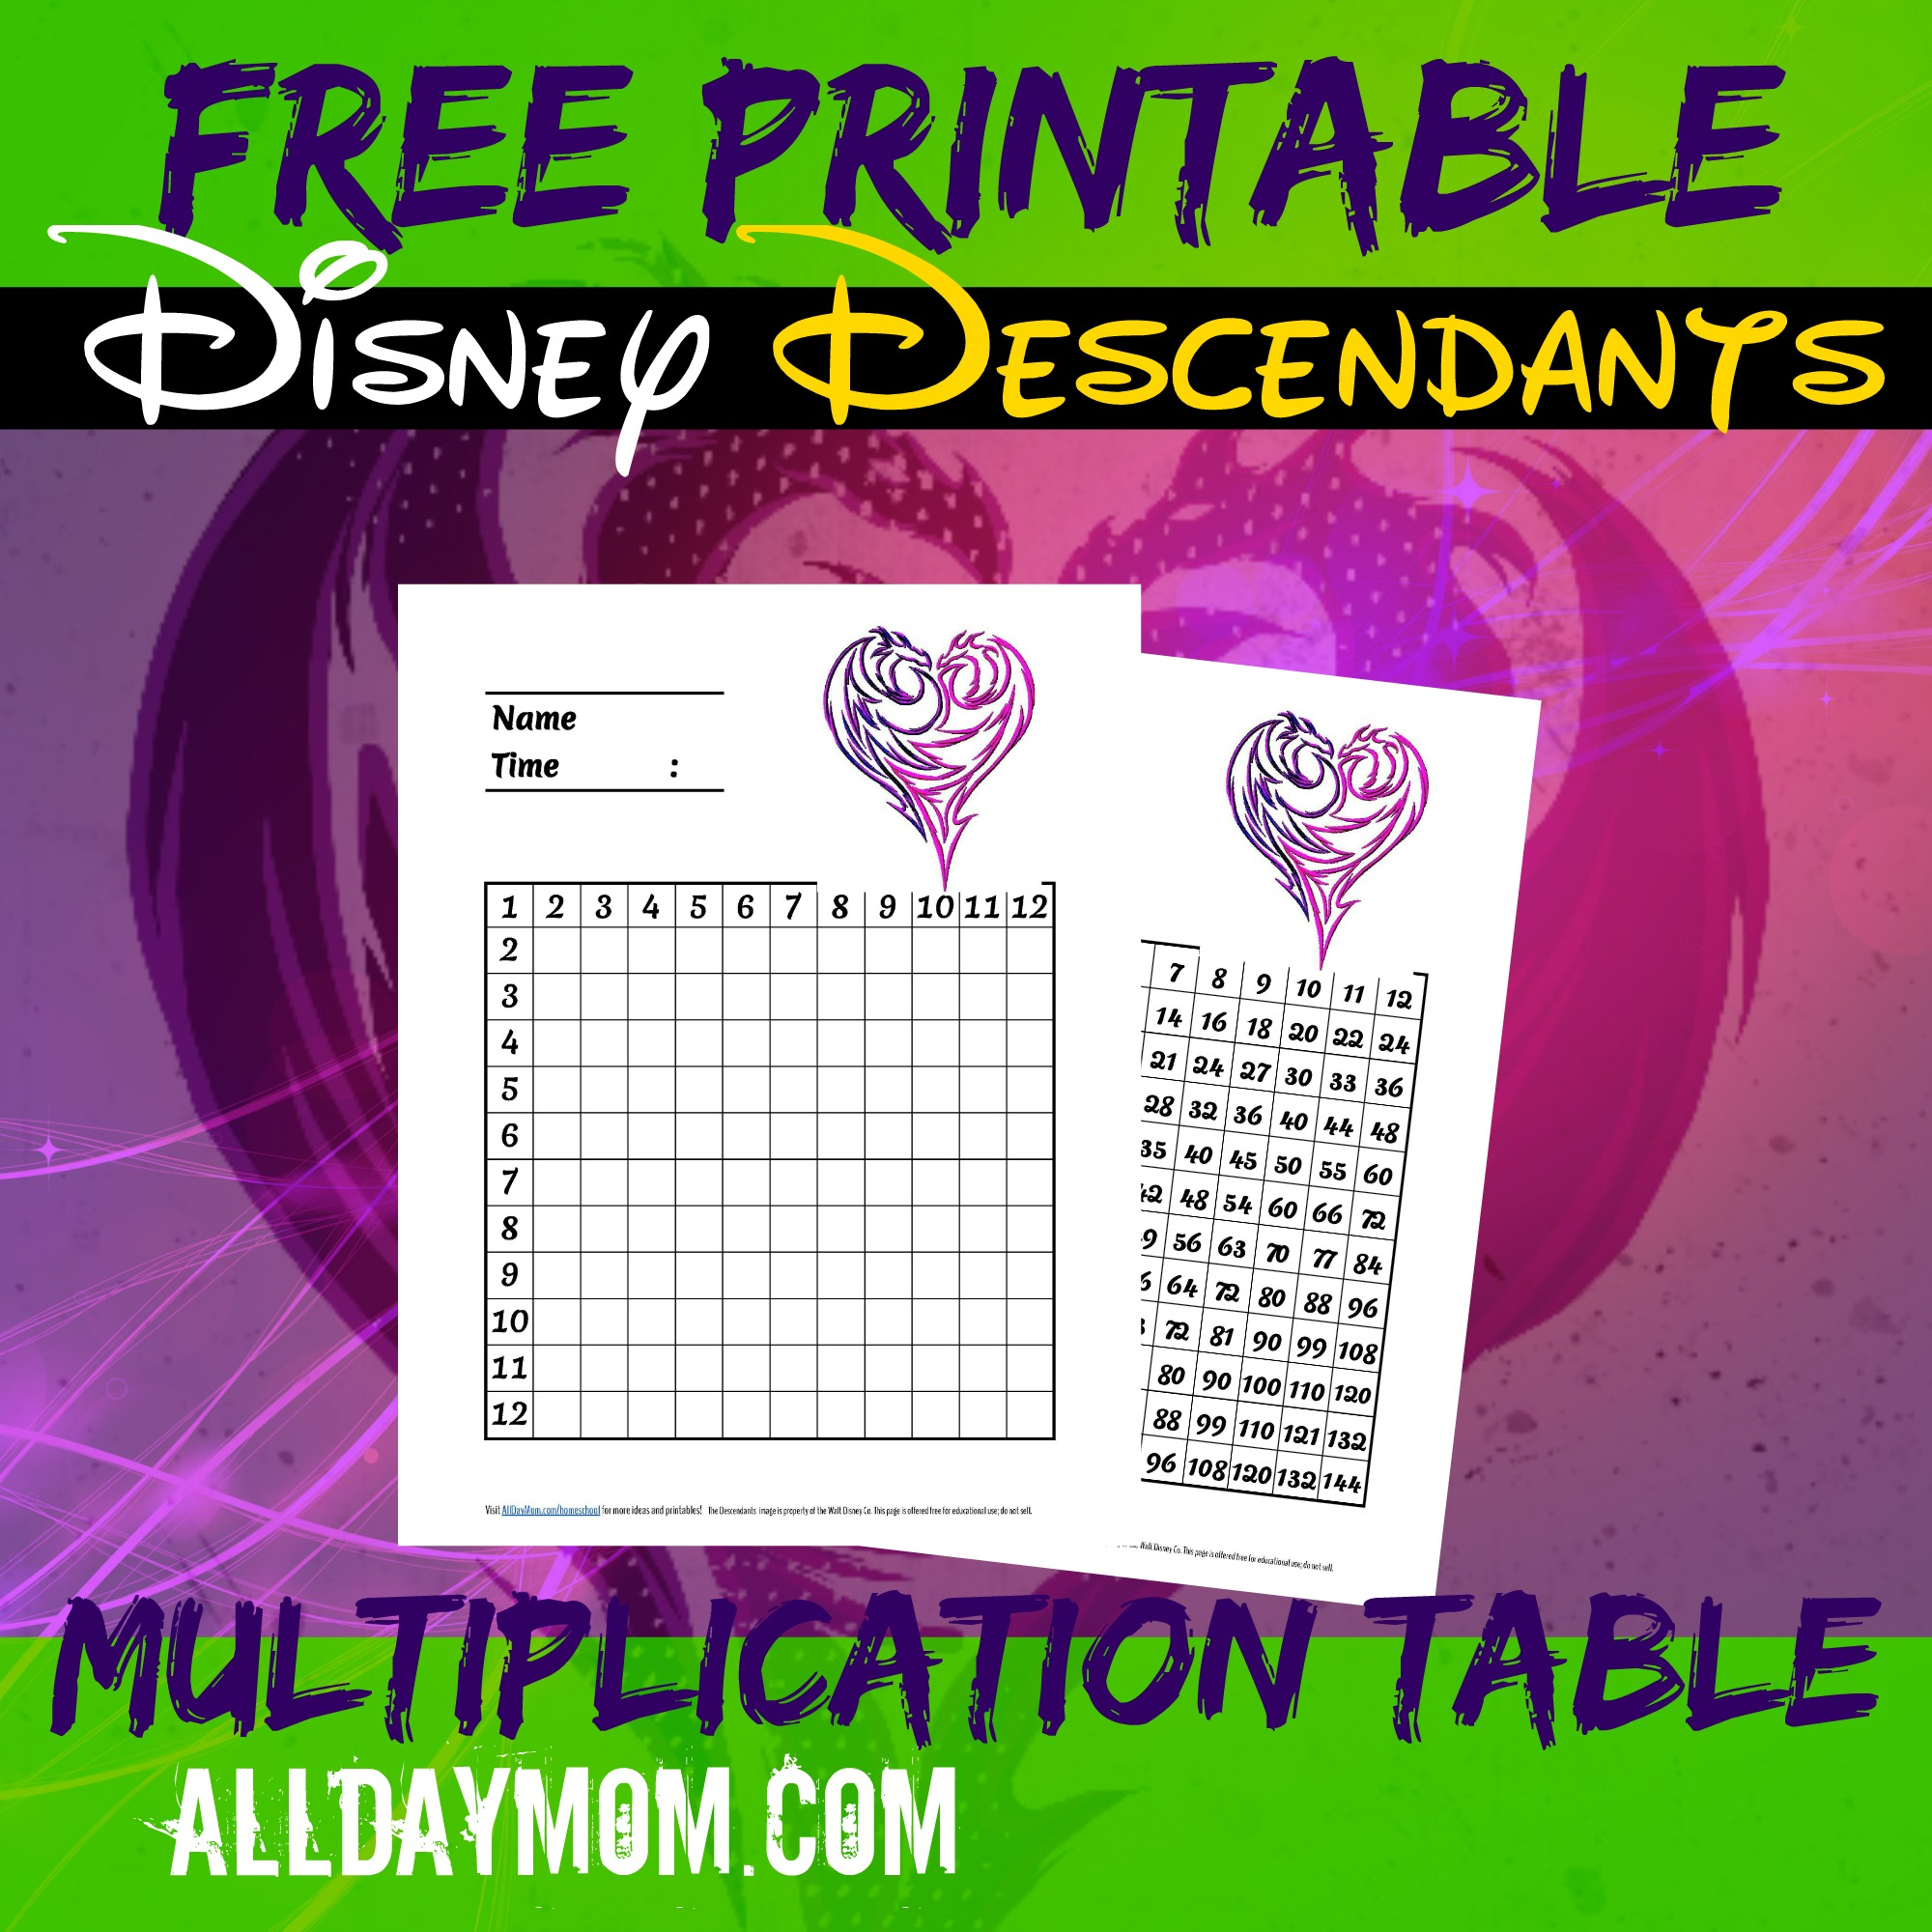 Free Printable Disney Math Worksheets Disney Descendants Multiplication Table And Guide